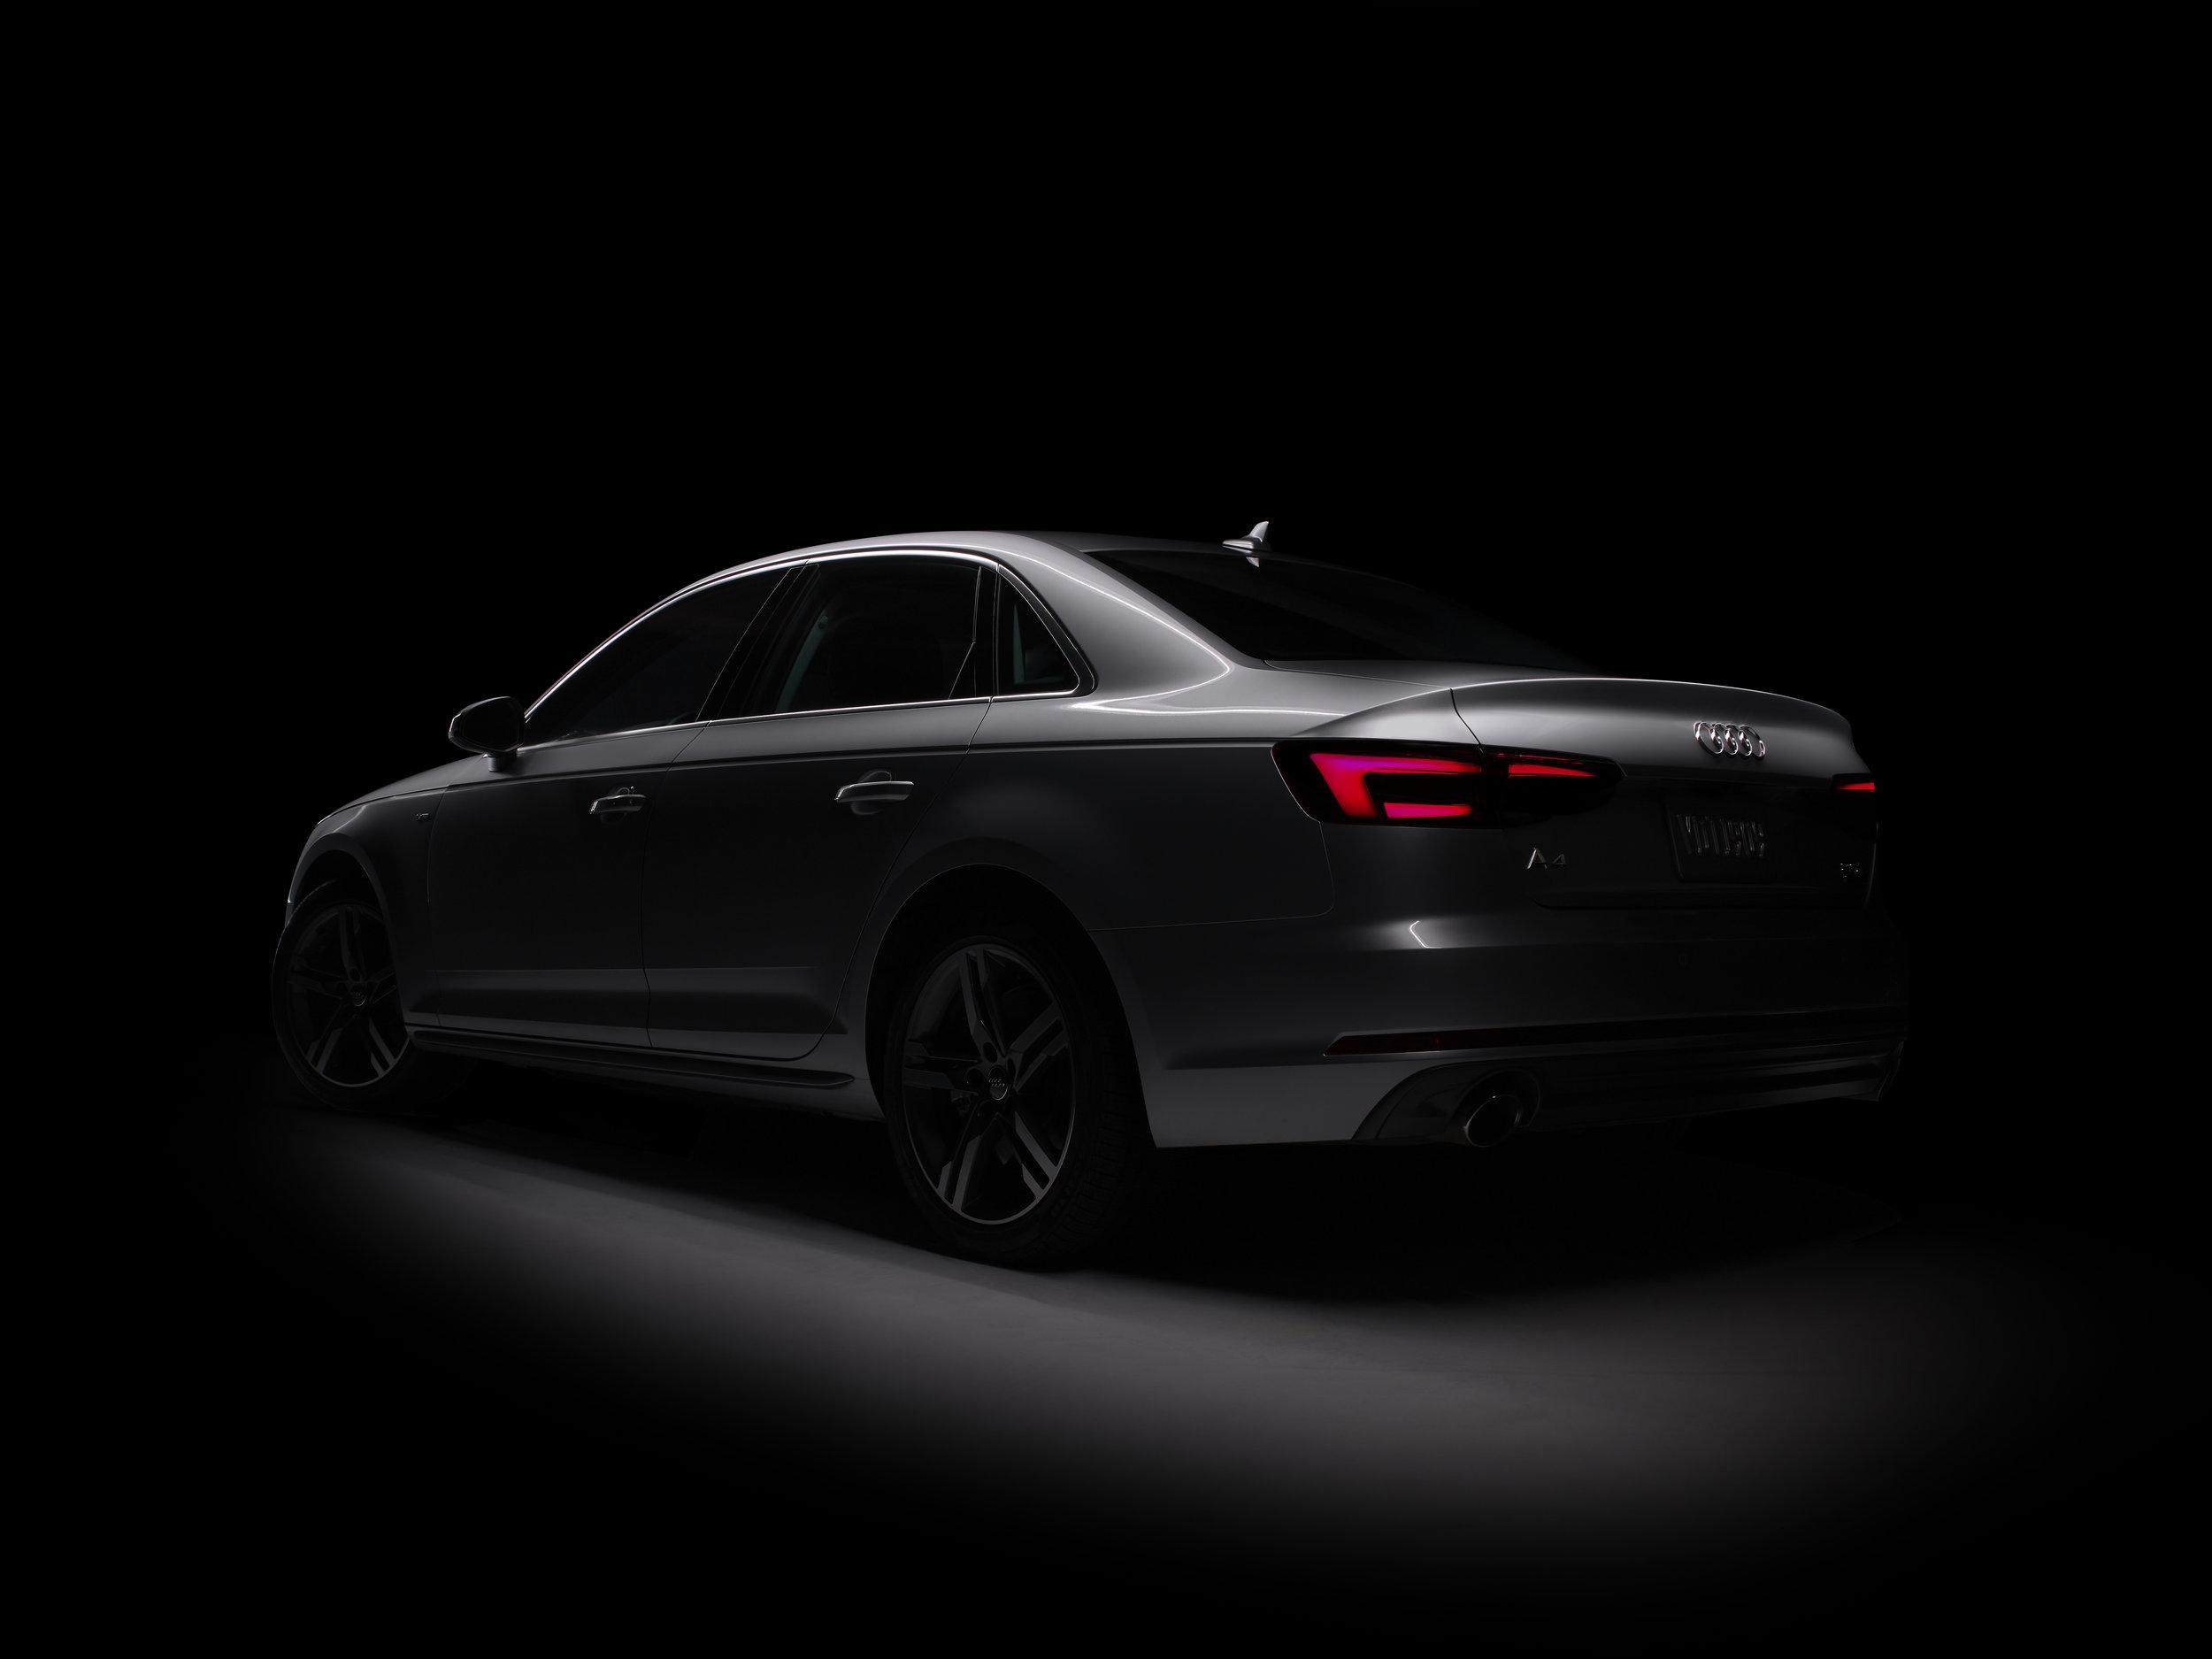 Audi_A4_In_The_Spotlight_D2_08.jpg